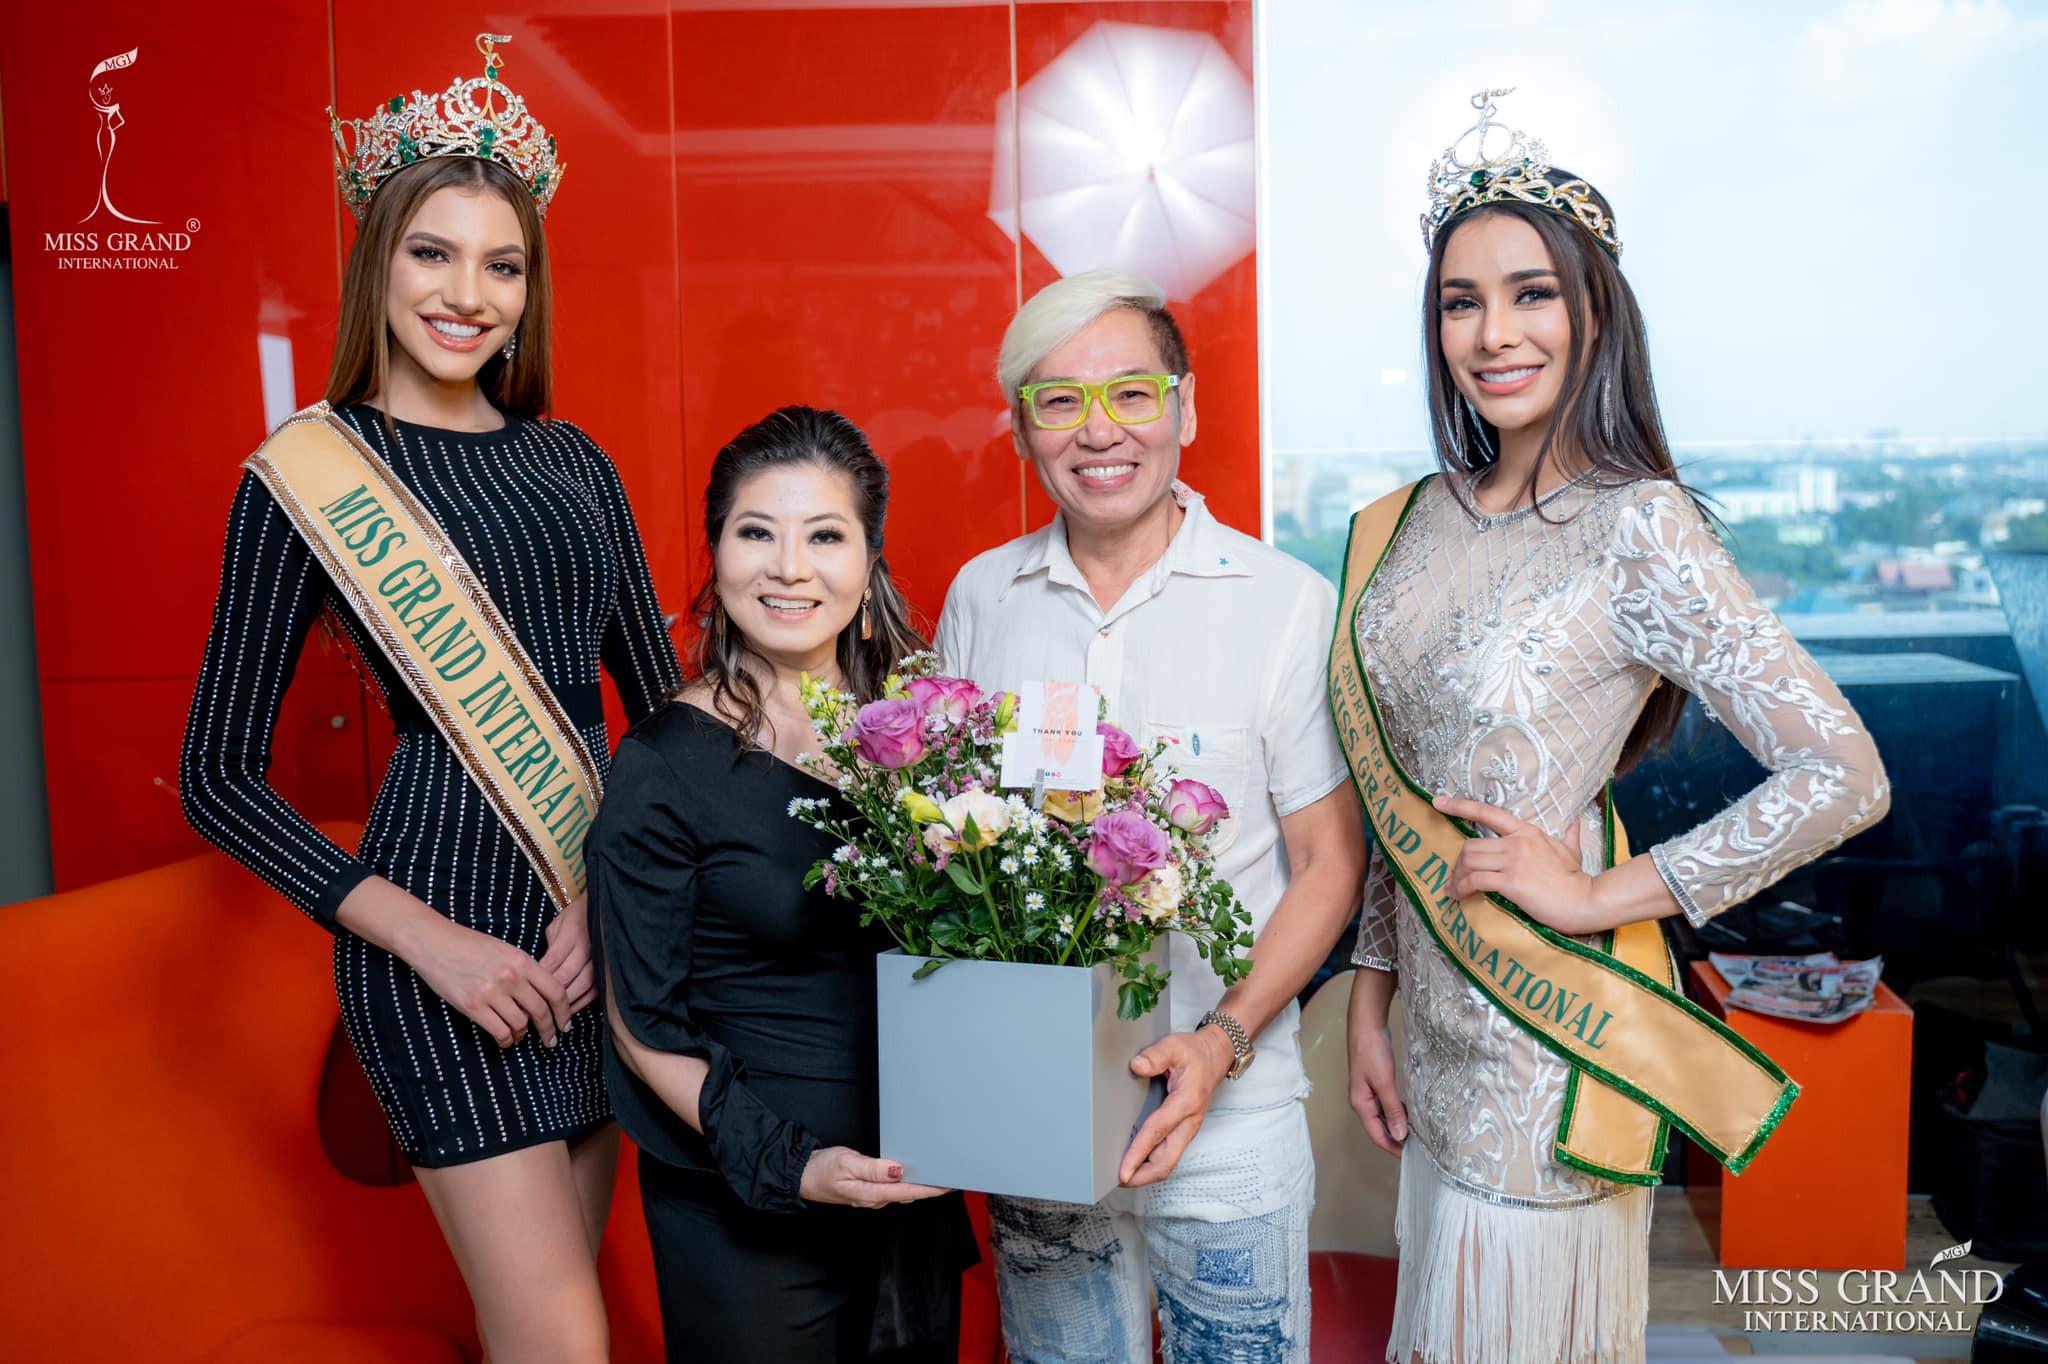 lourdes valentina figuera, miss grand international 2019. - Página 22 Fekmbe10